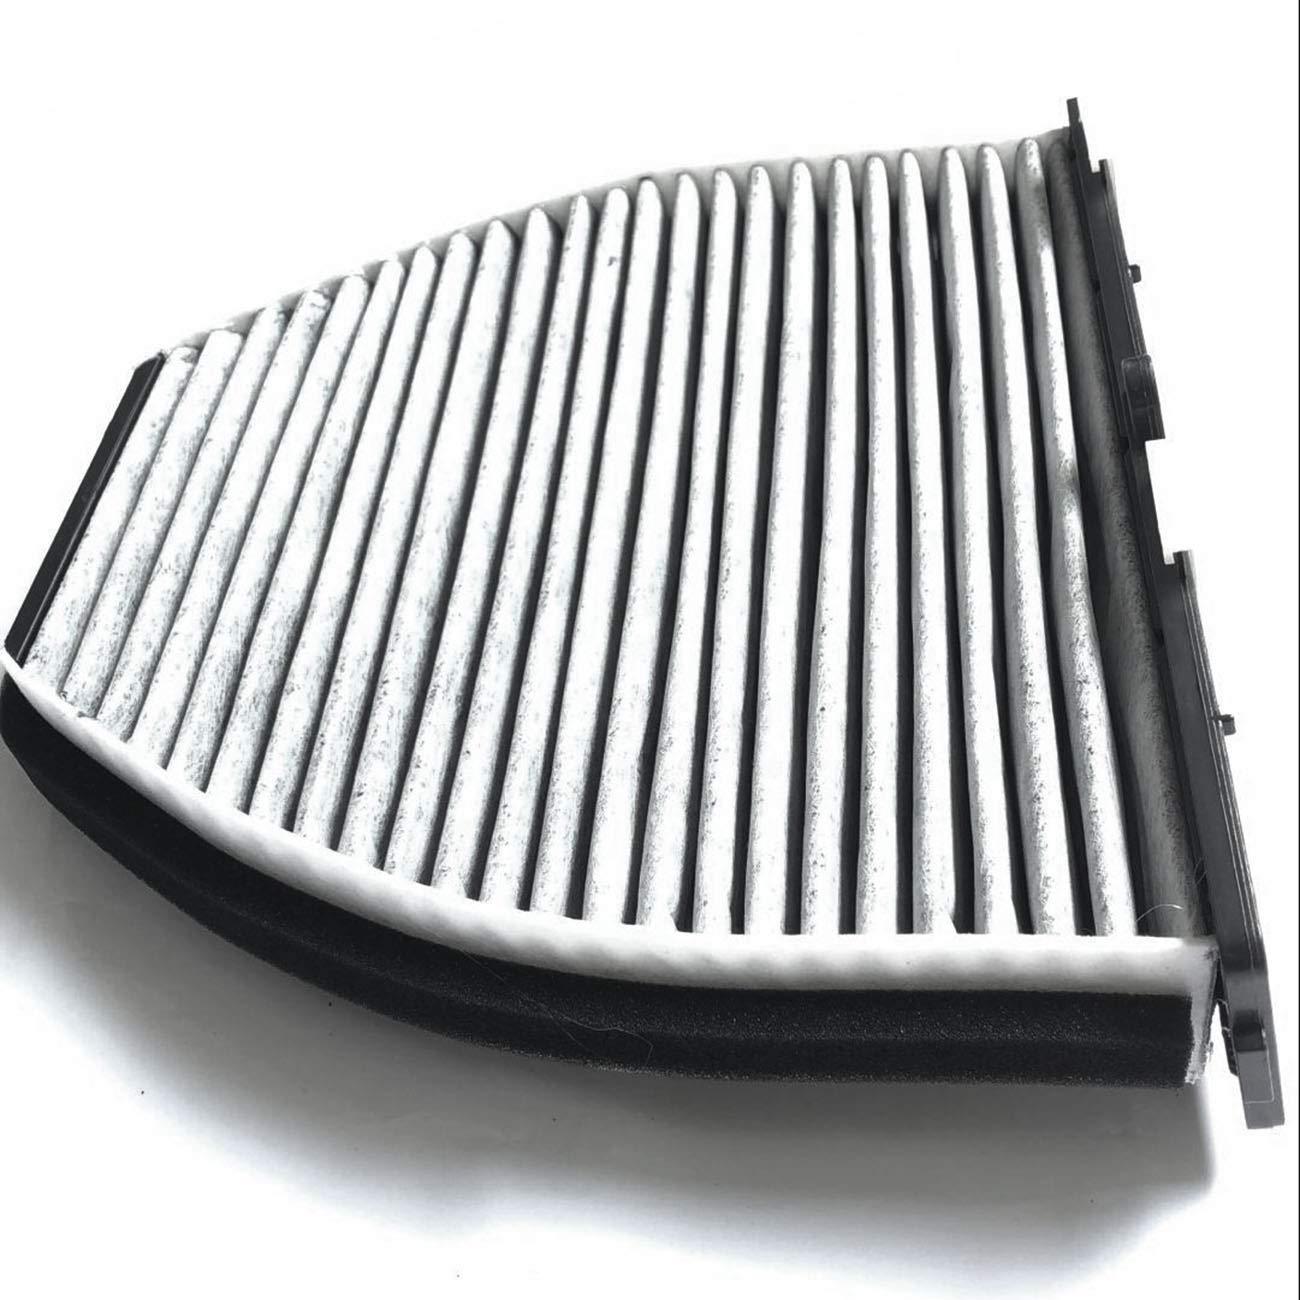 Semoic pour Mercedes W218 A207 R231 C204 V212 S212 Amggt Filtre /à Air DHabitacle Mann Cuk29005 Cuk2551